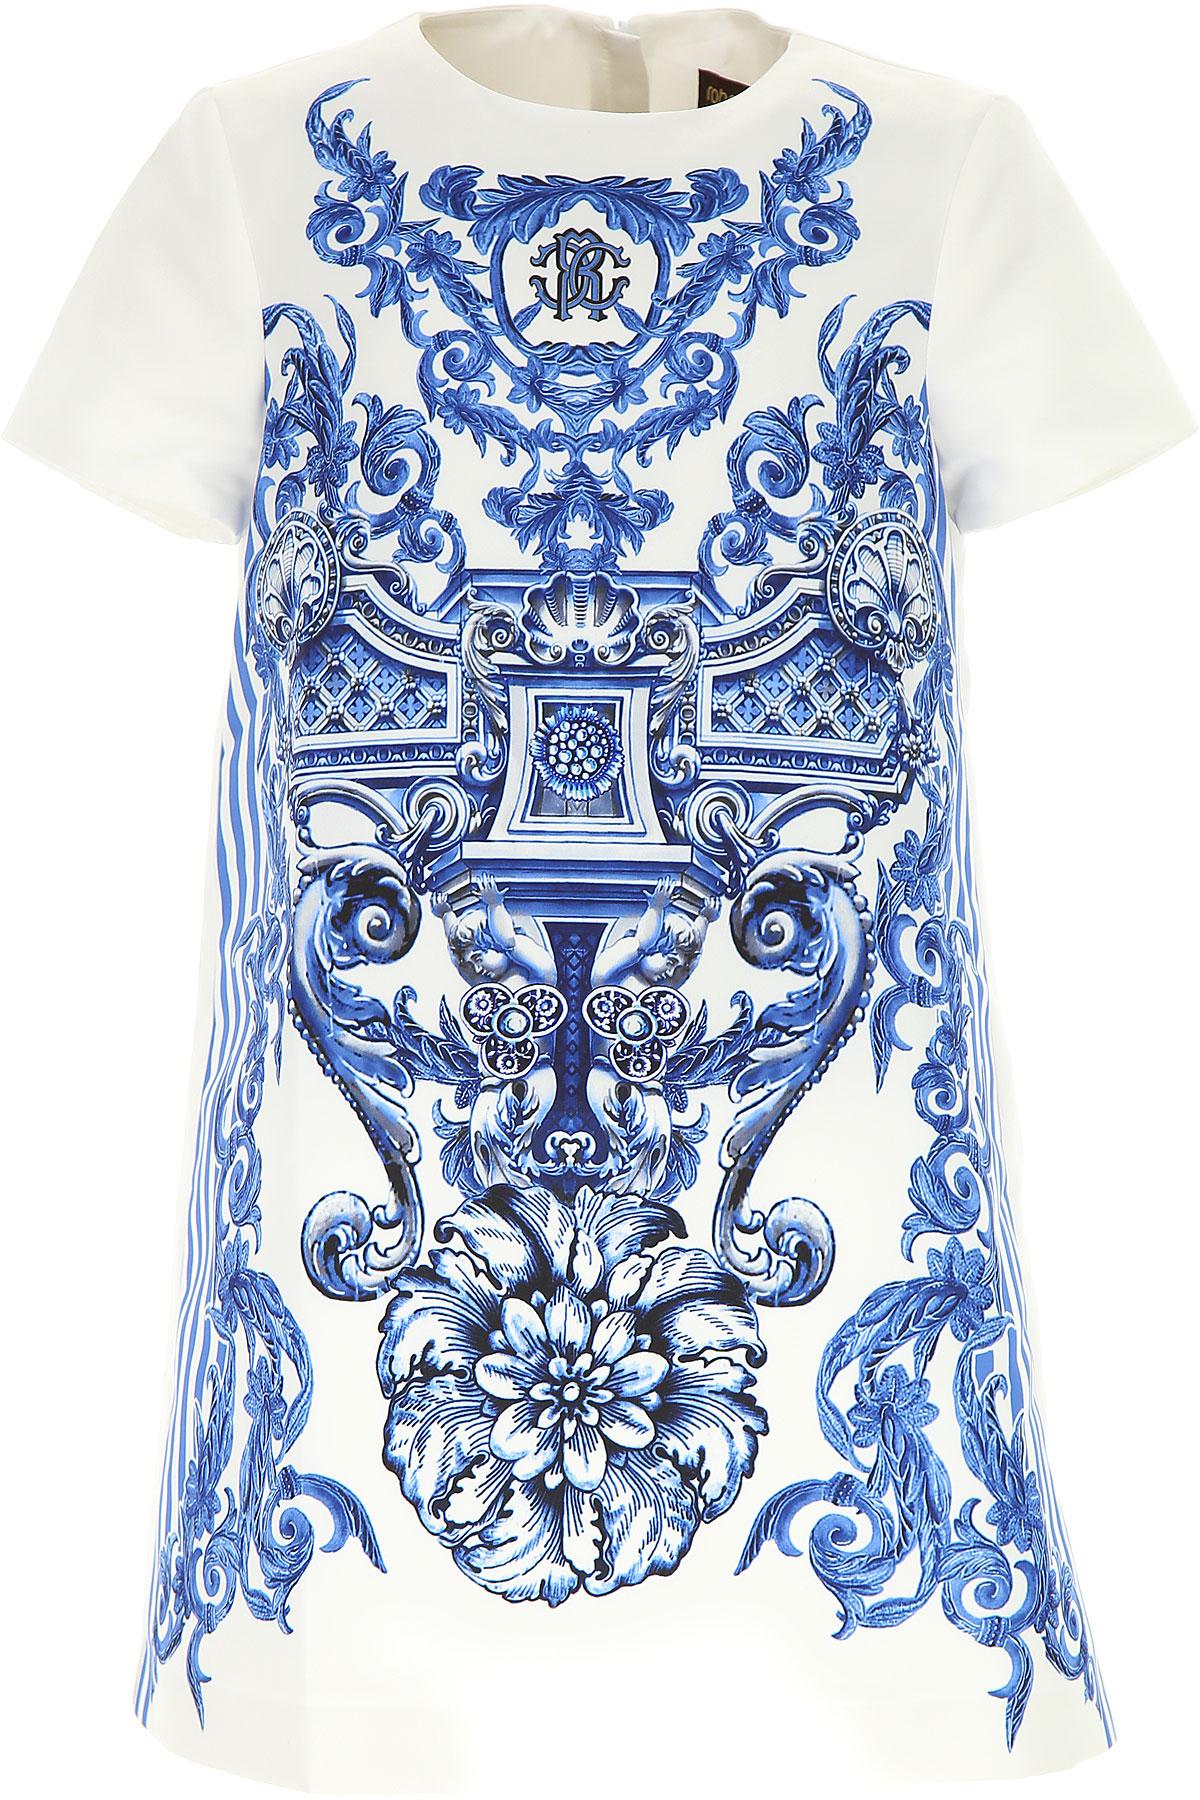 Roberto Cavalli Girls Dress On Sale, White, polyester, 2017, 10Y 6Y USA-444870